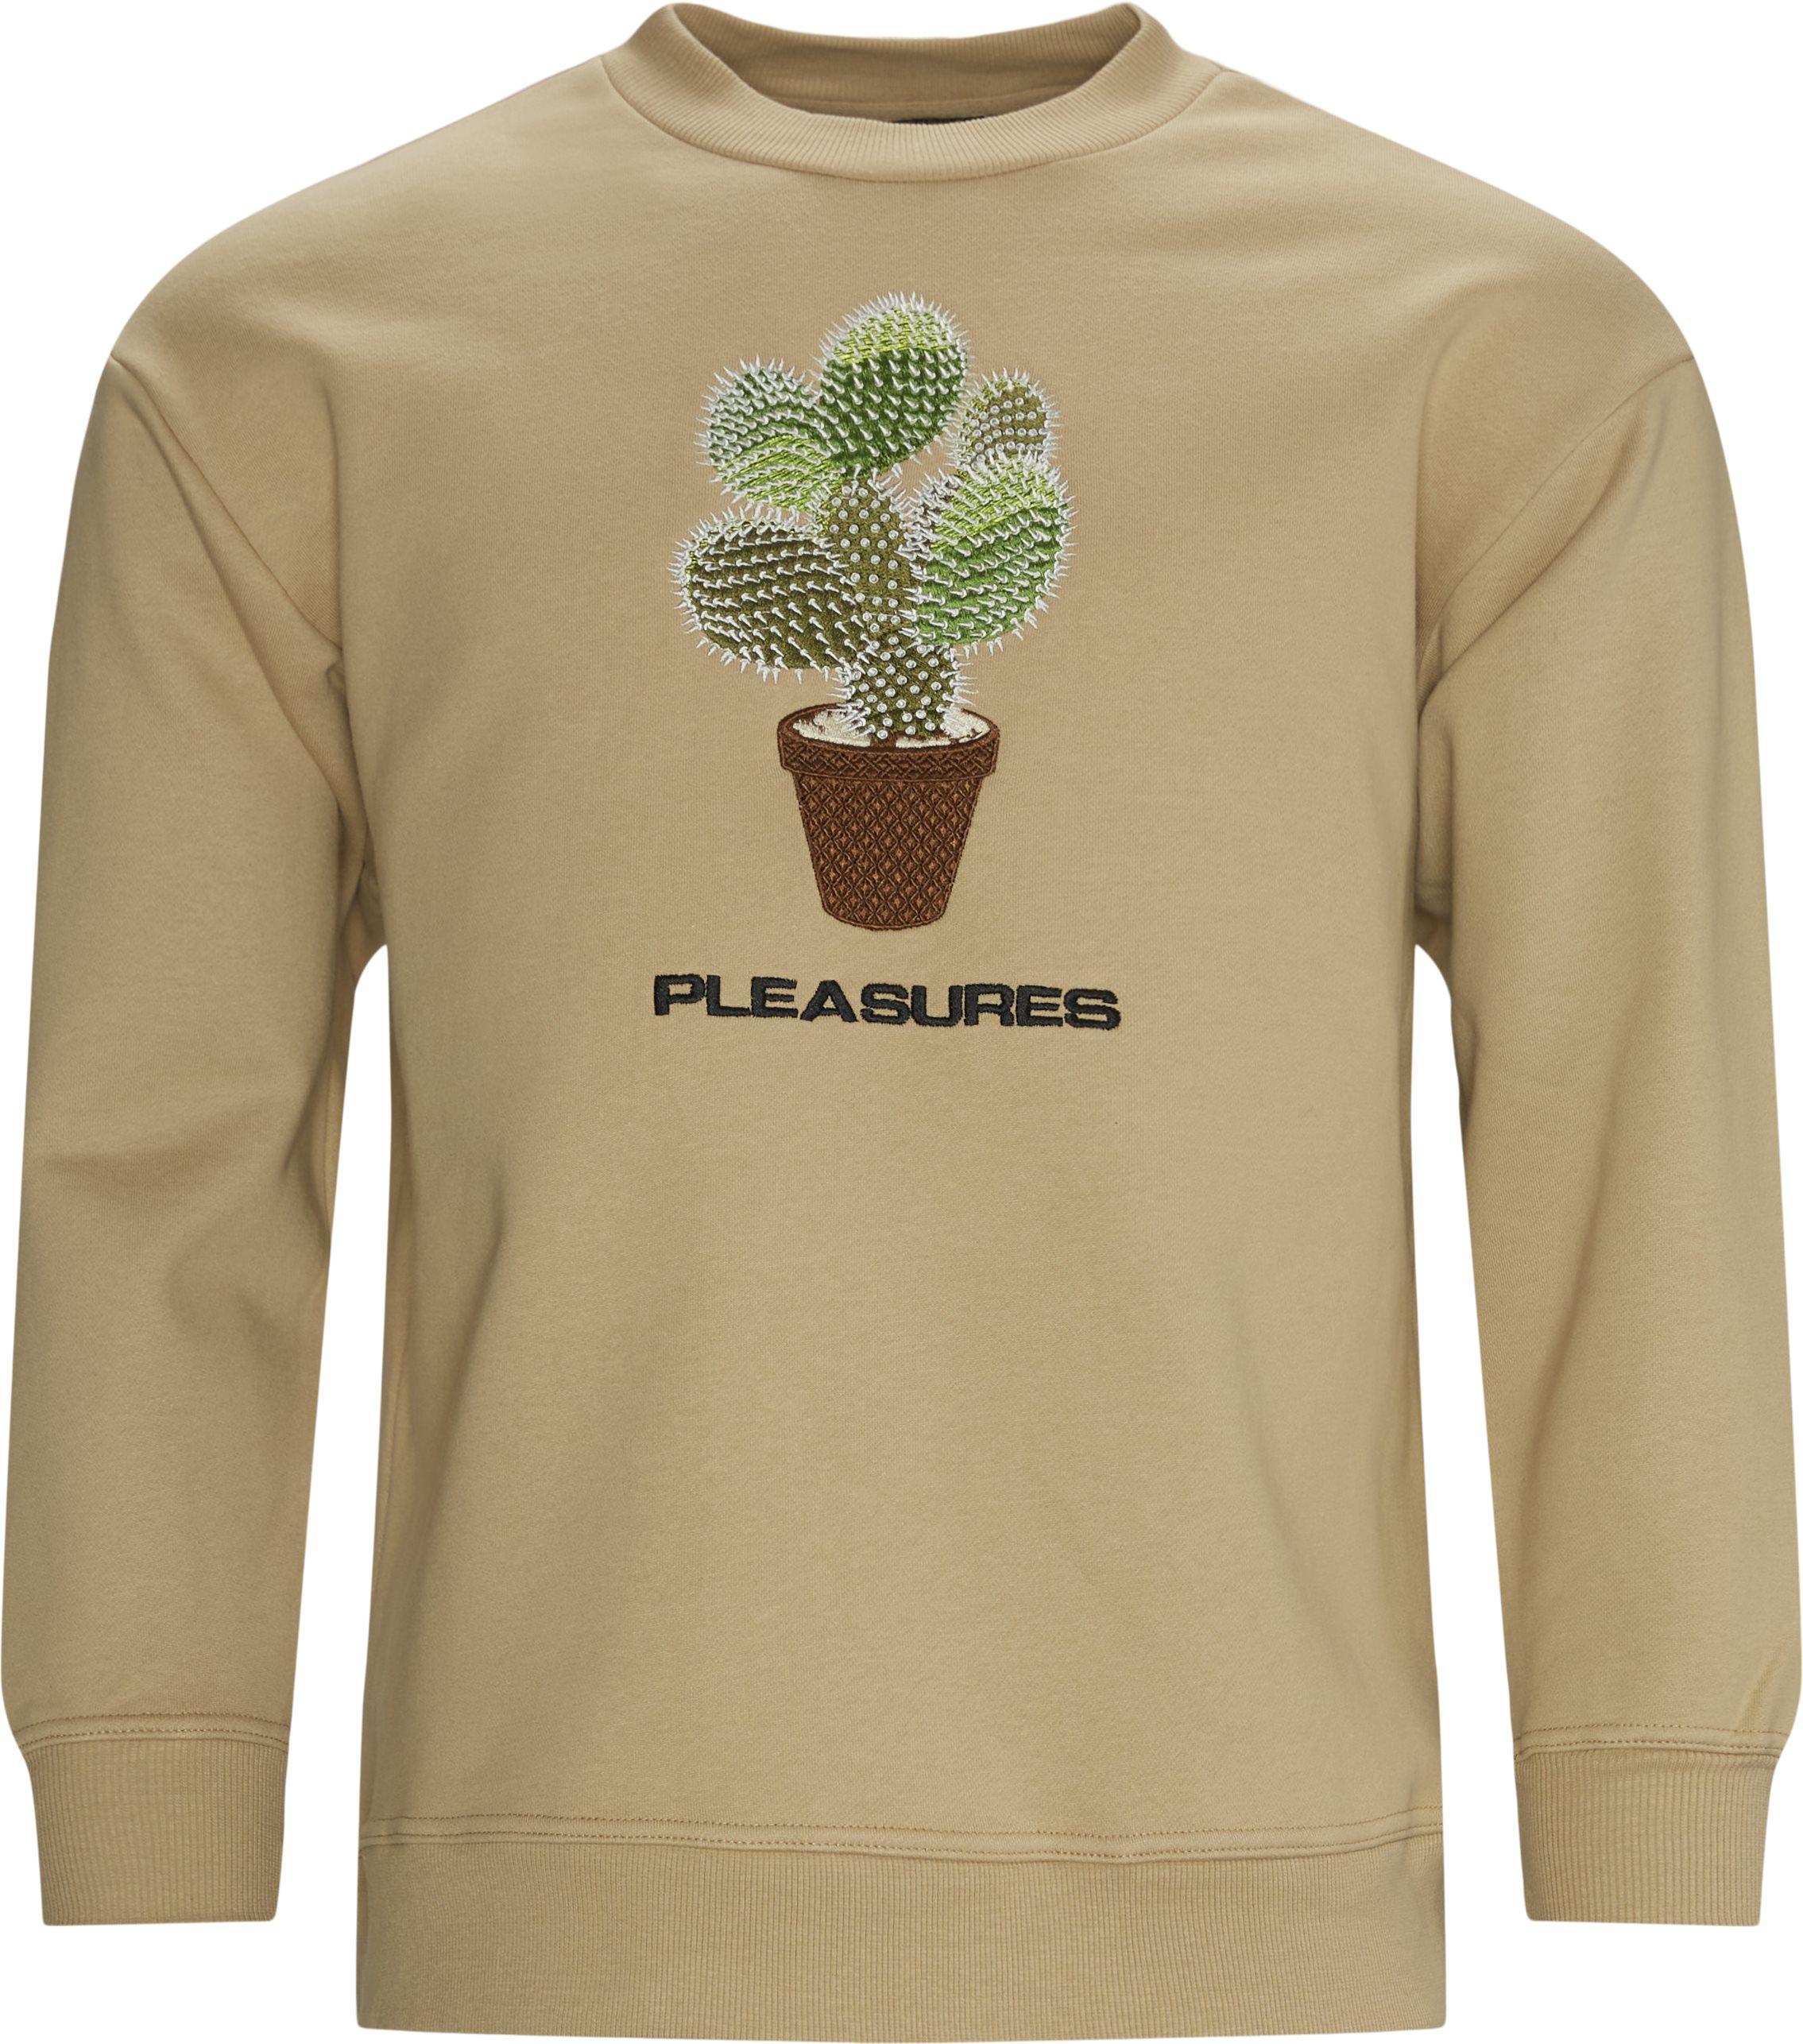 Spike Embroidered Crewneck - Sweatshirts - Regular fit - Sand